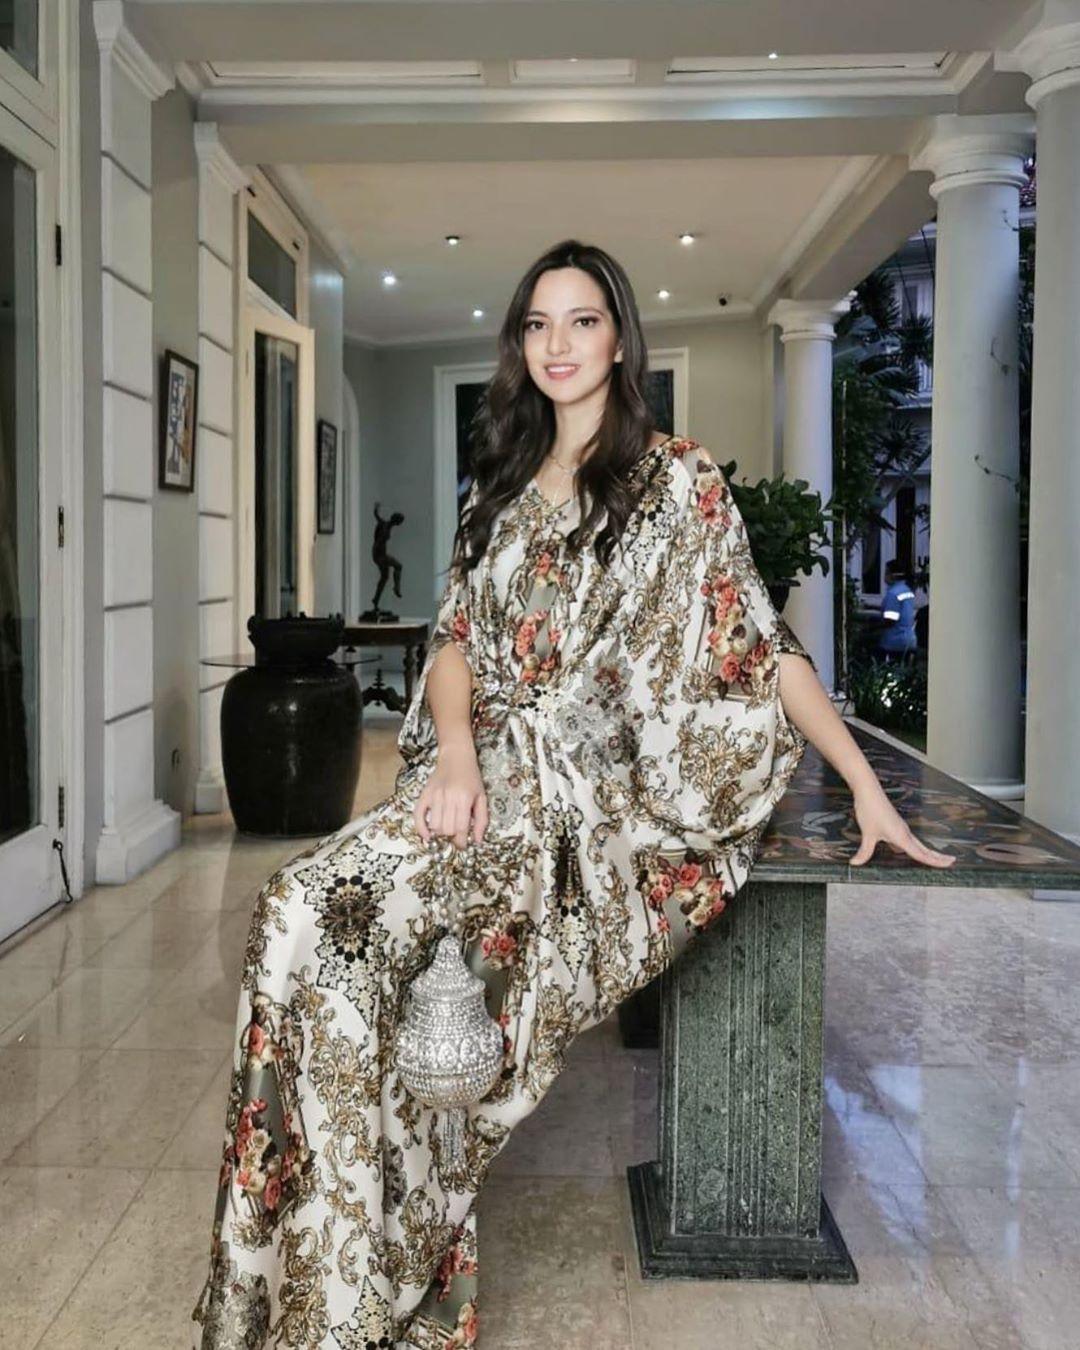 7 Artis Cewek Indonesia yang Terkenal Hobi Belanja Barang Mewah